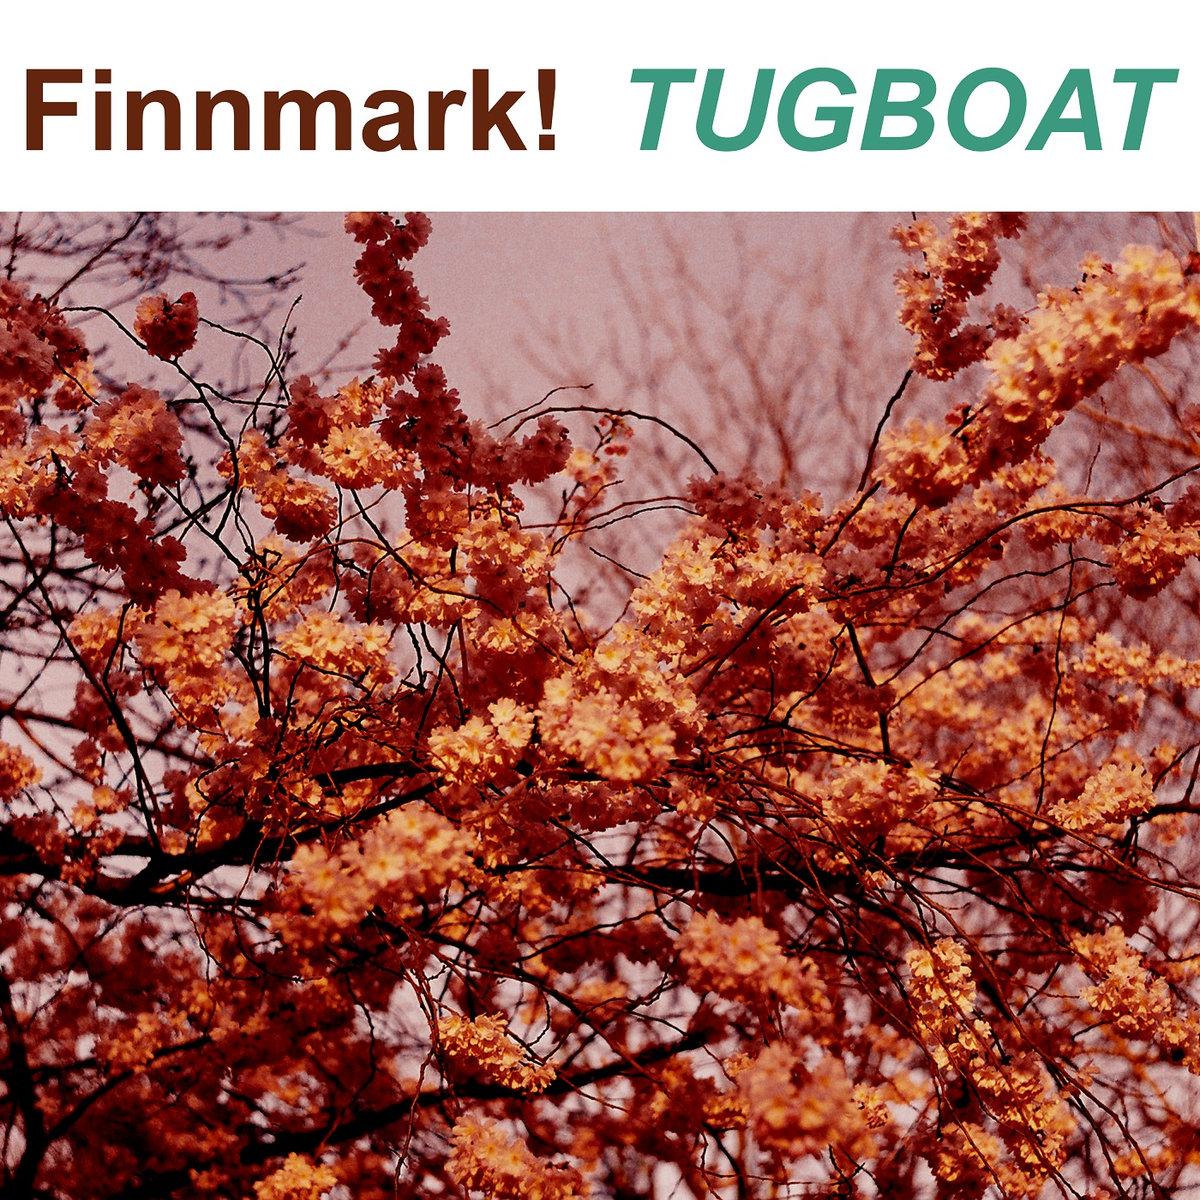 Finnmark! Tugboat